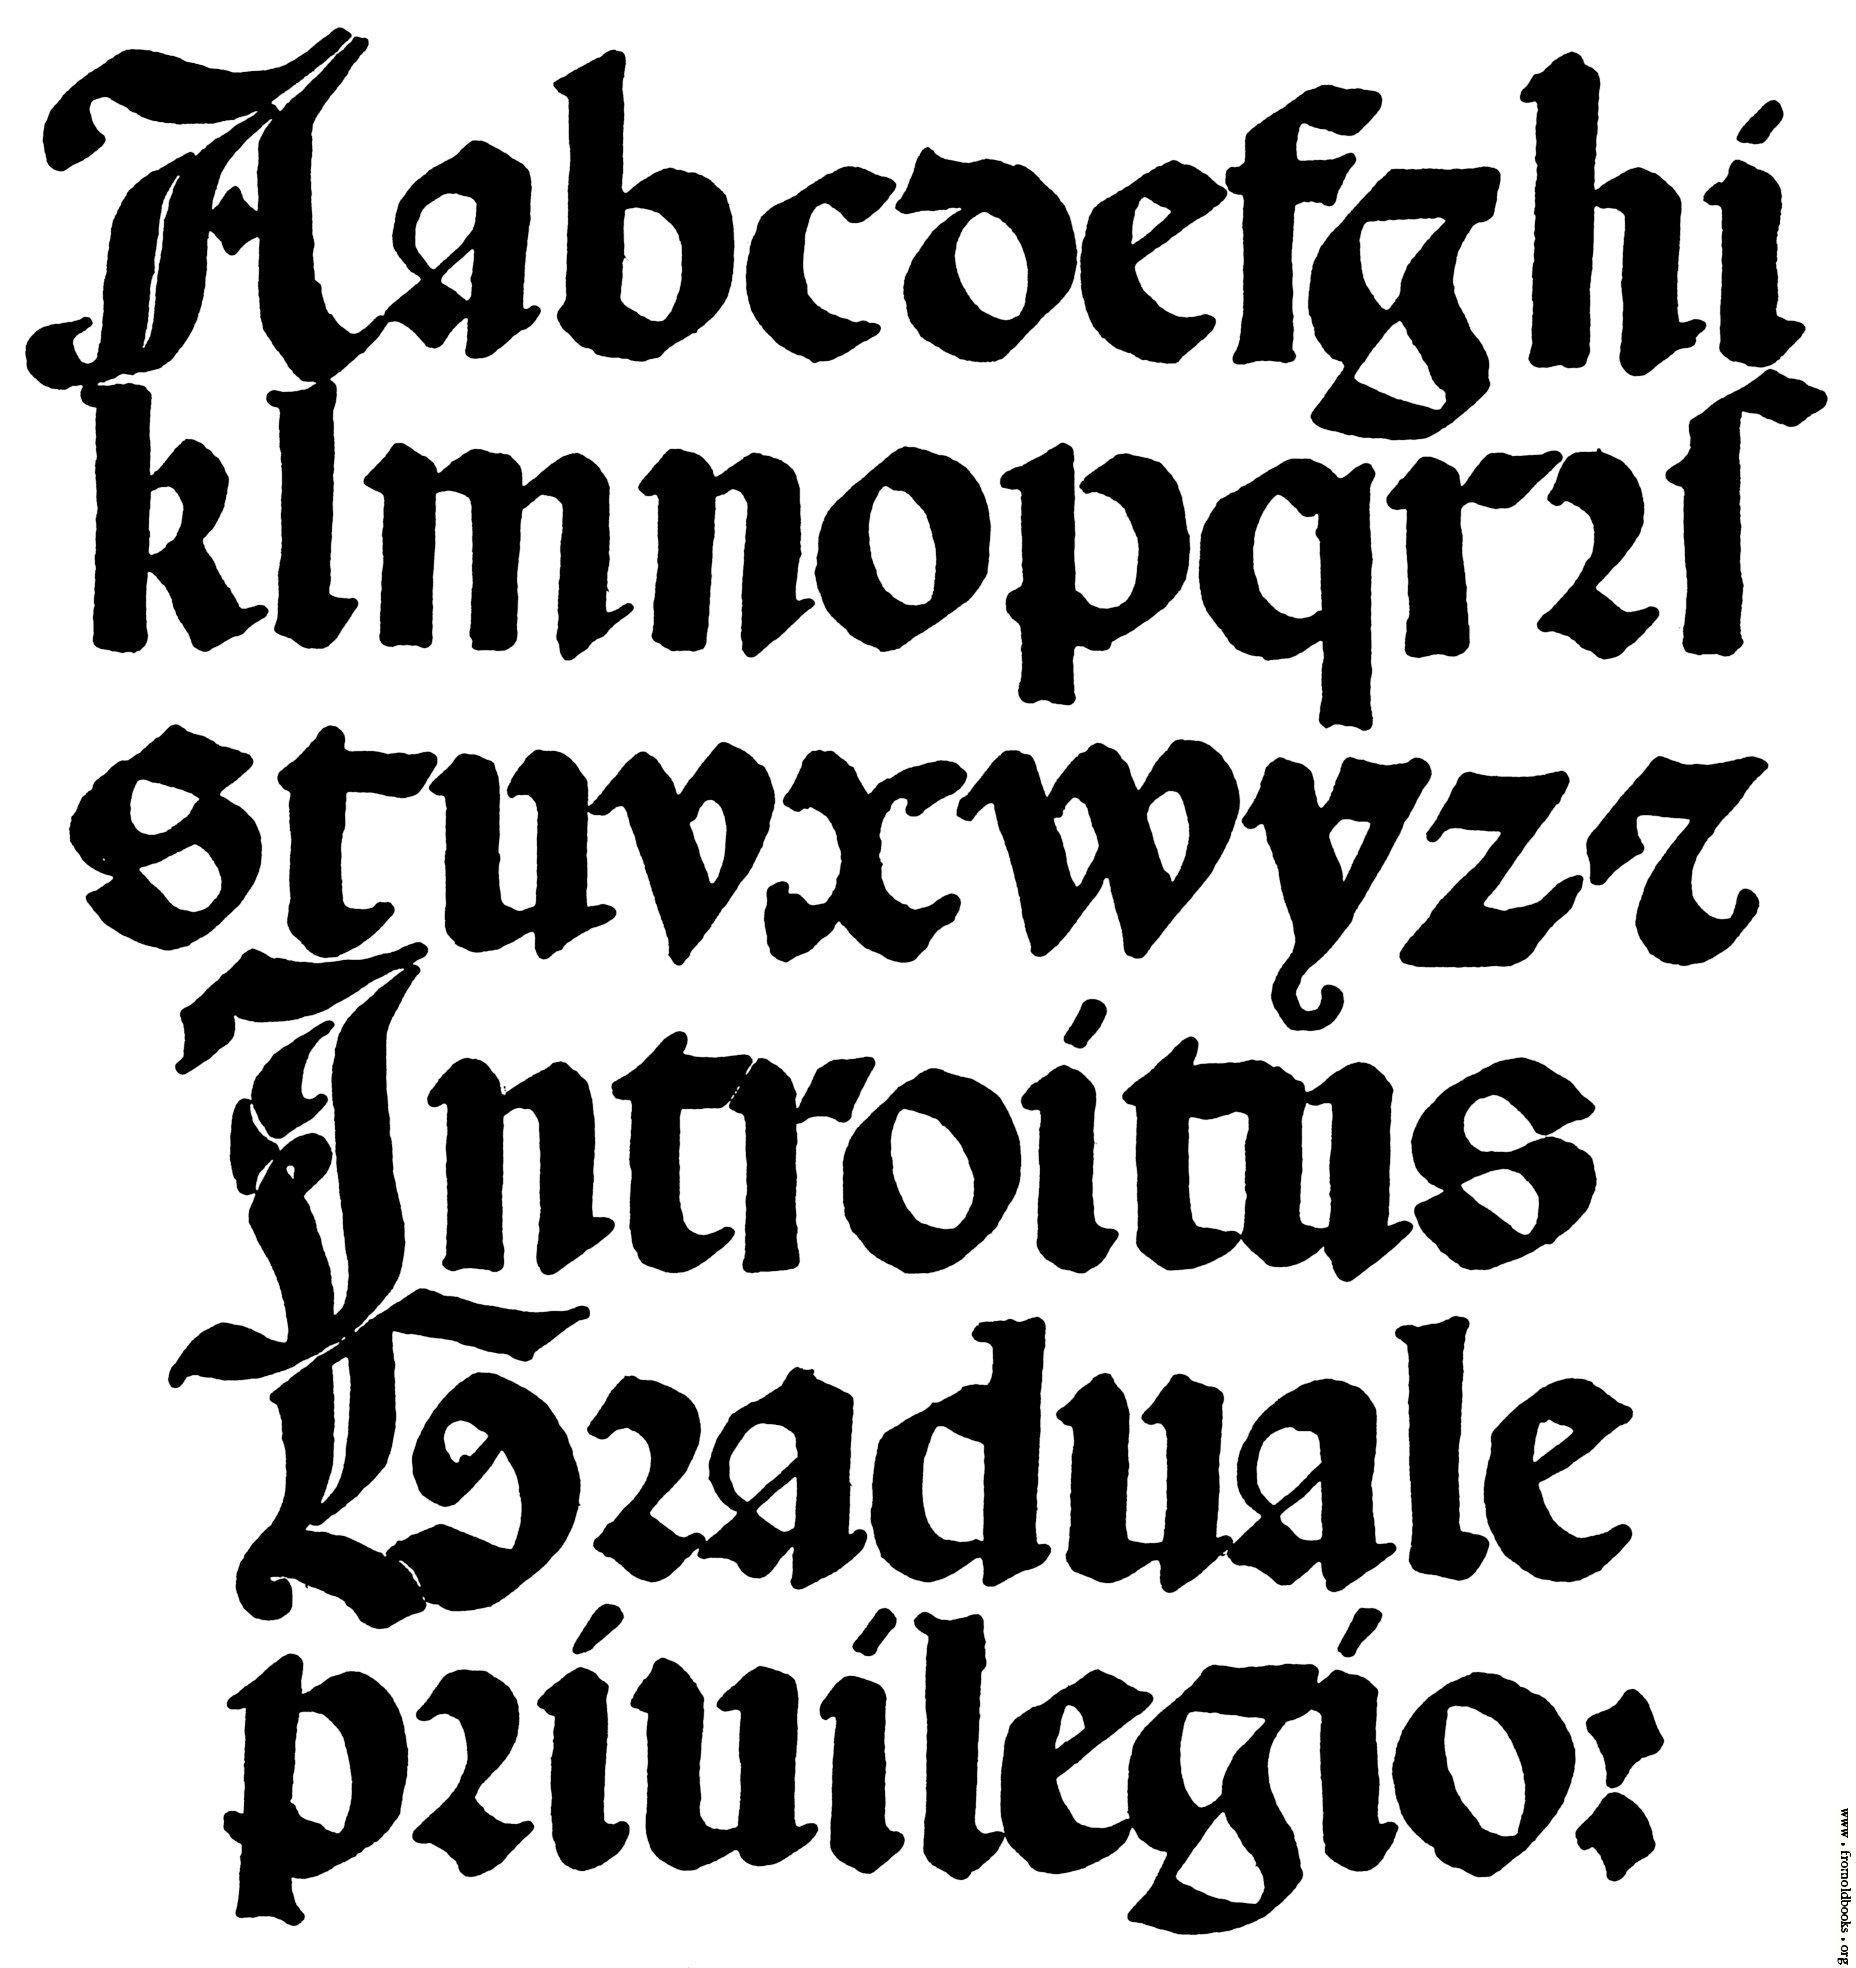 13 16 Century Gothic Letter Fonts Images